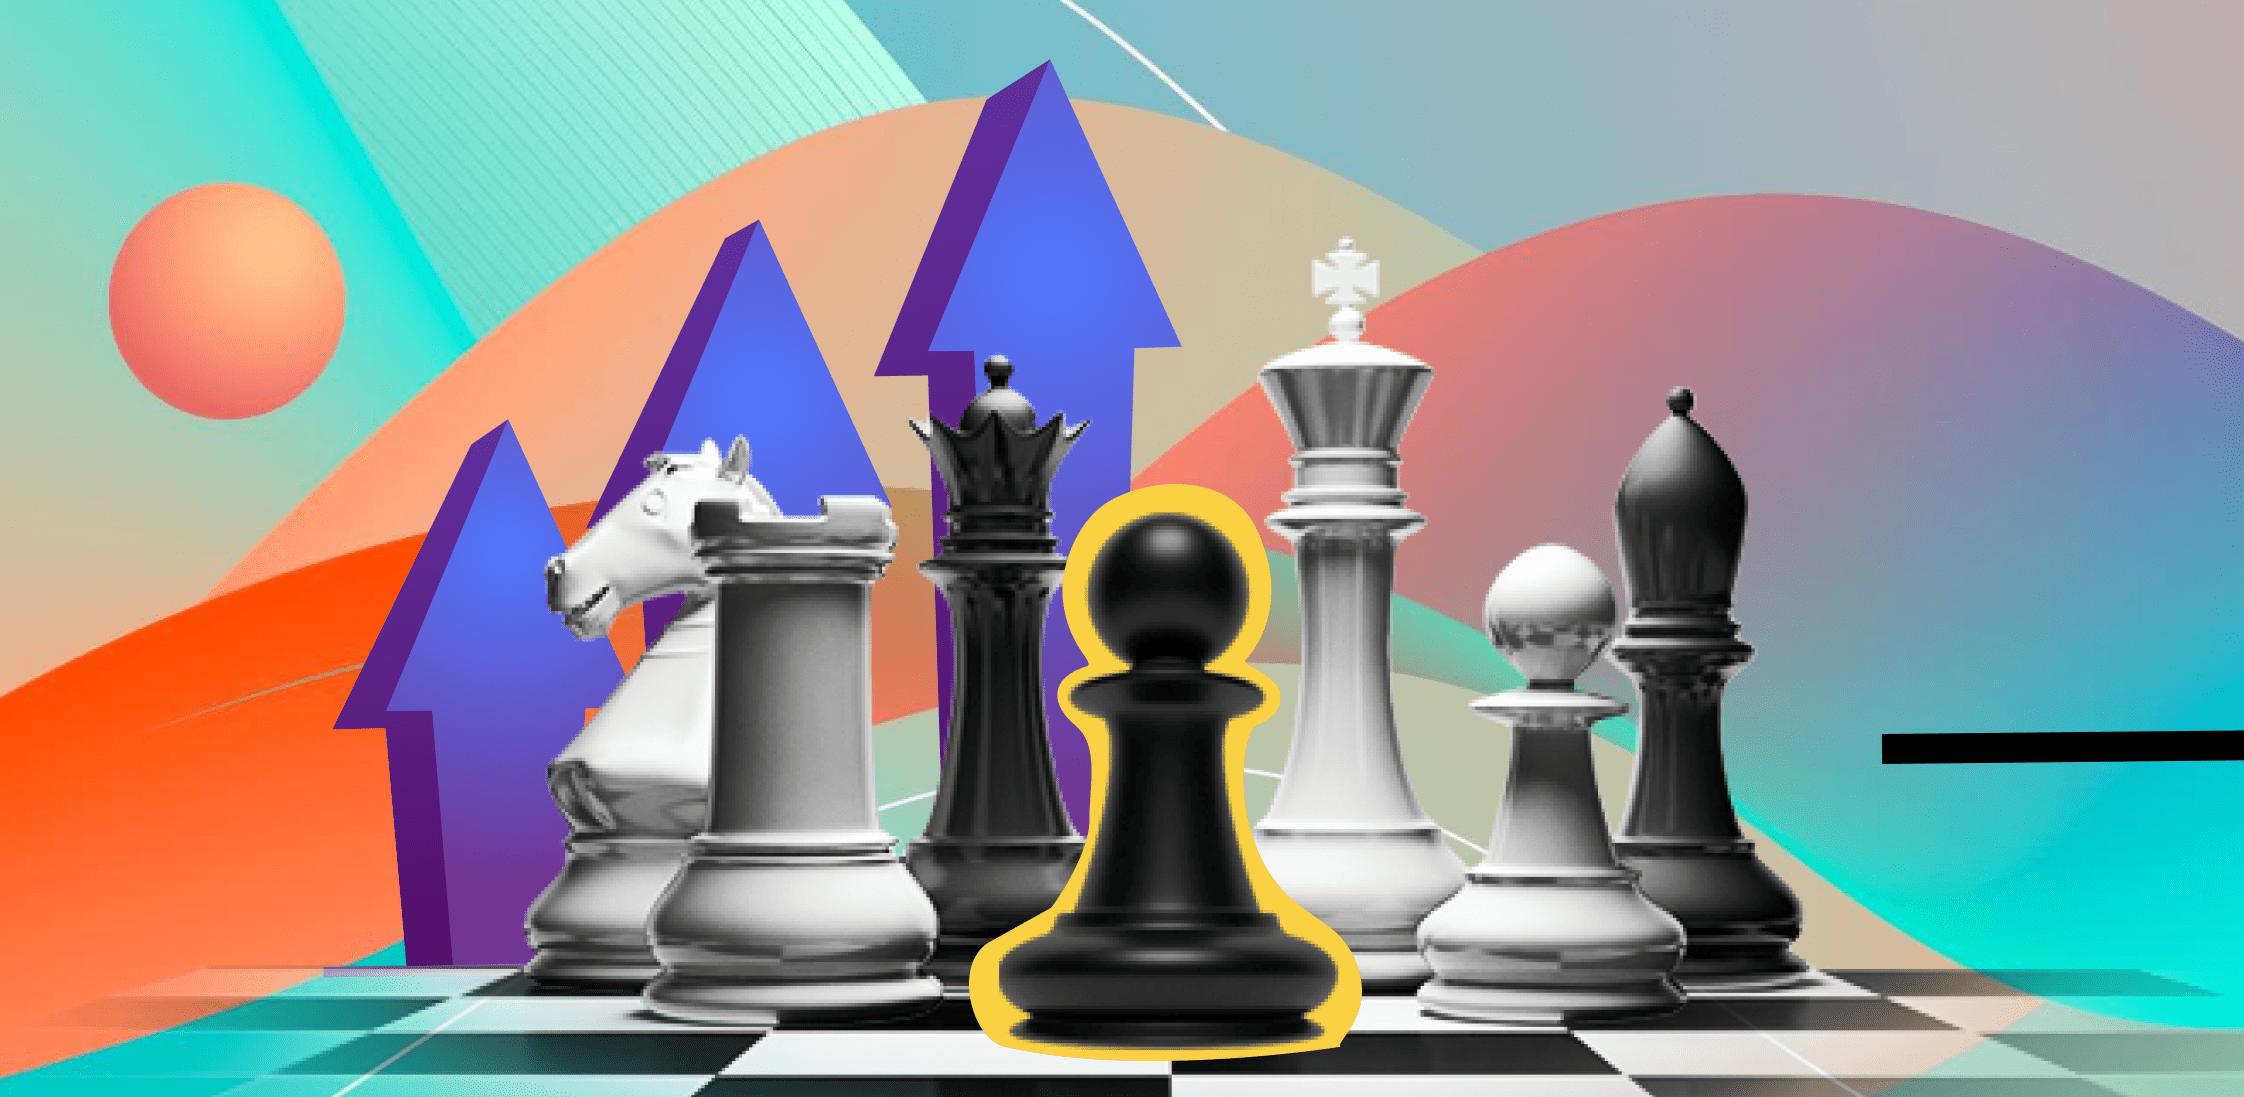 Що таке стратегічний маркетинг - Блог Admixer Academy